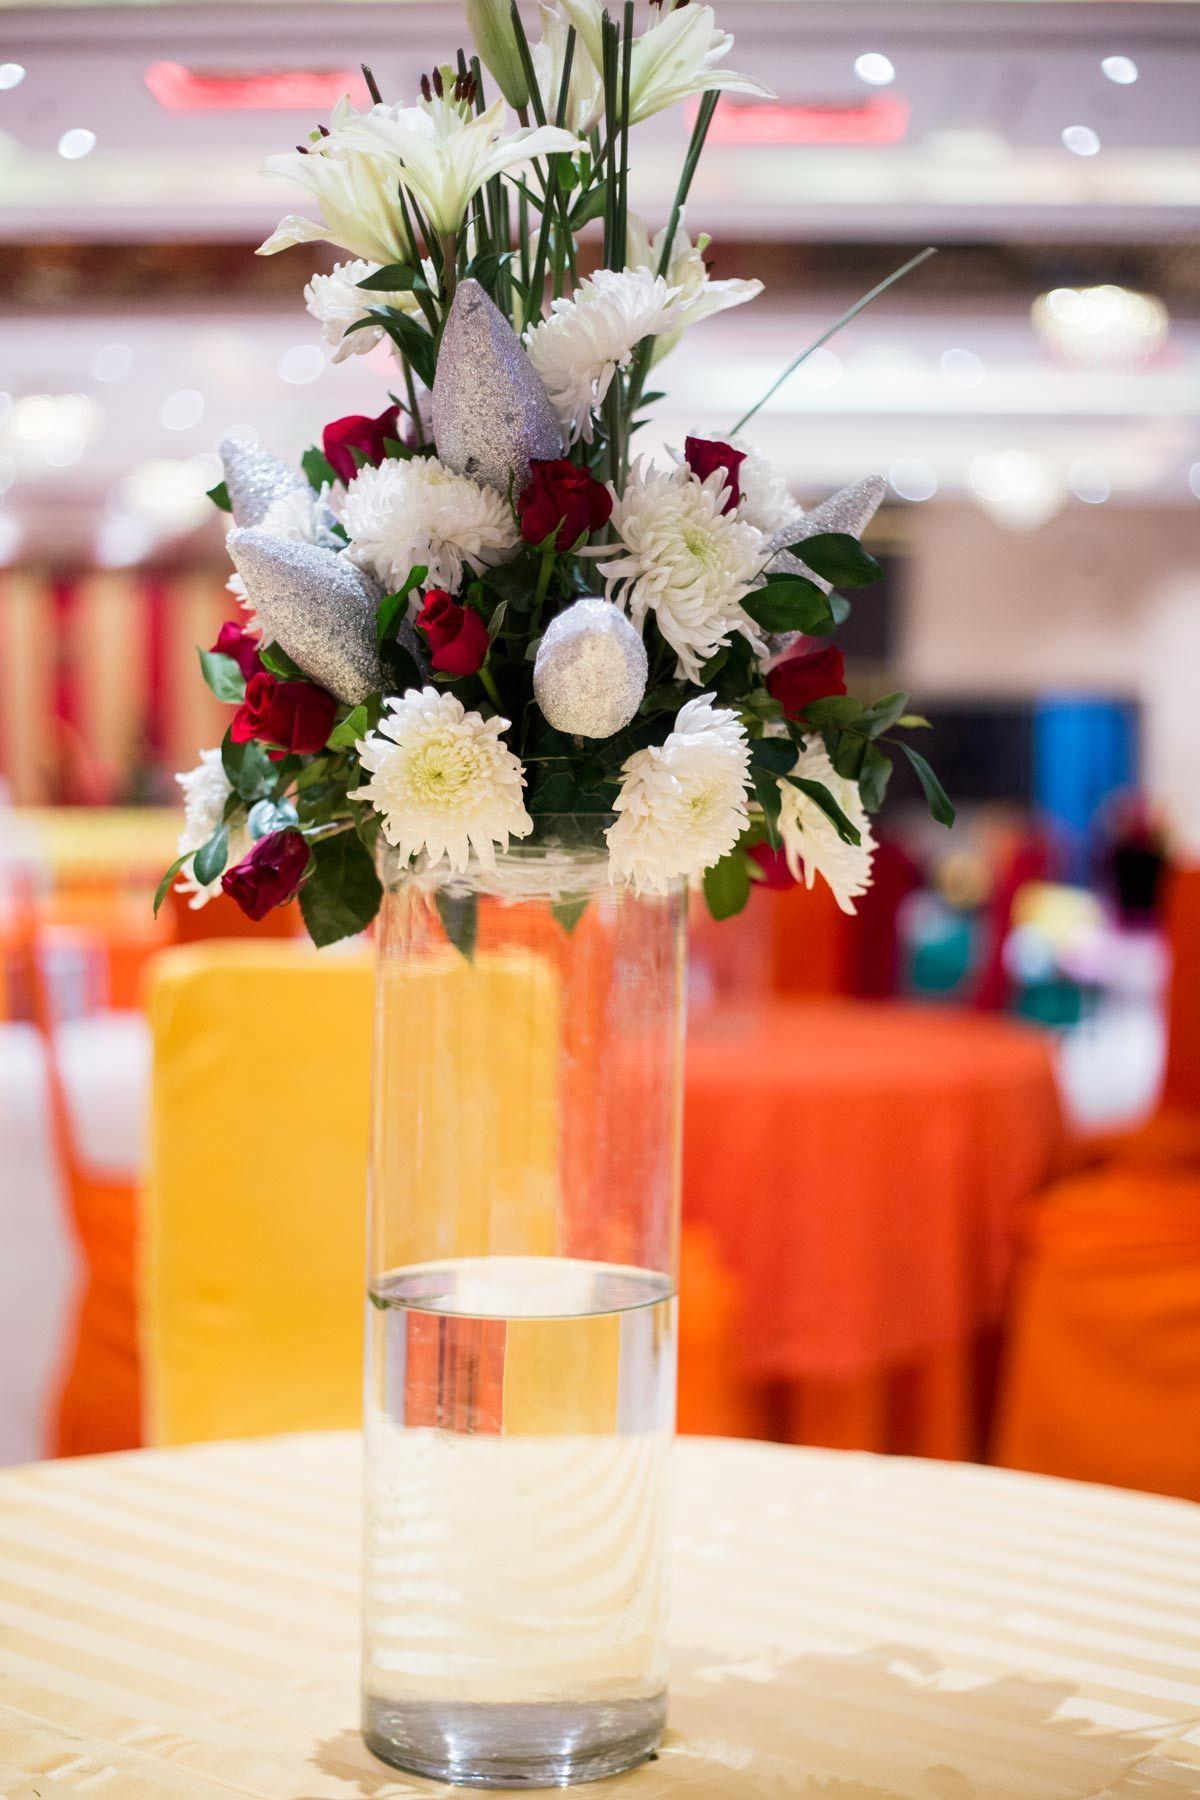 kasturi orchid jodpur, wedding decoration, flower decoration